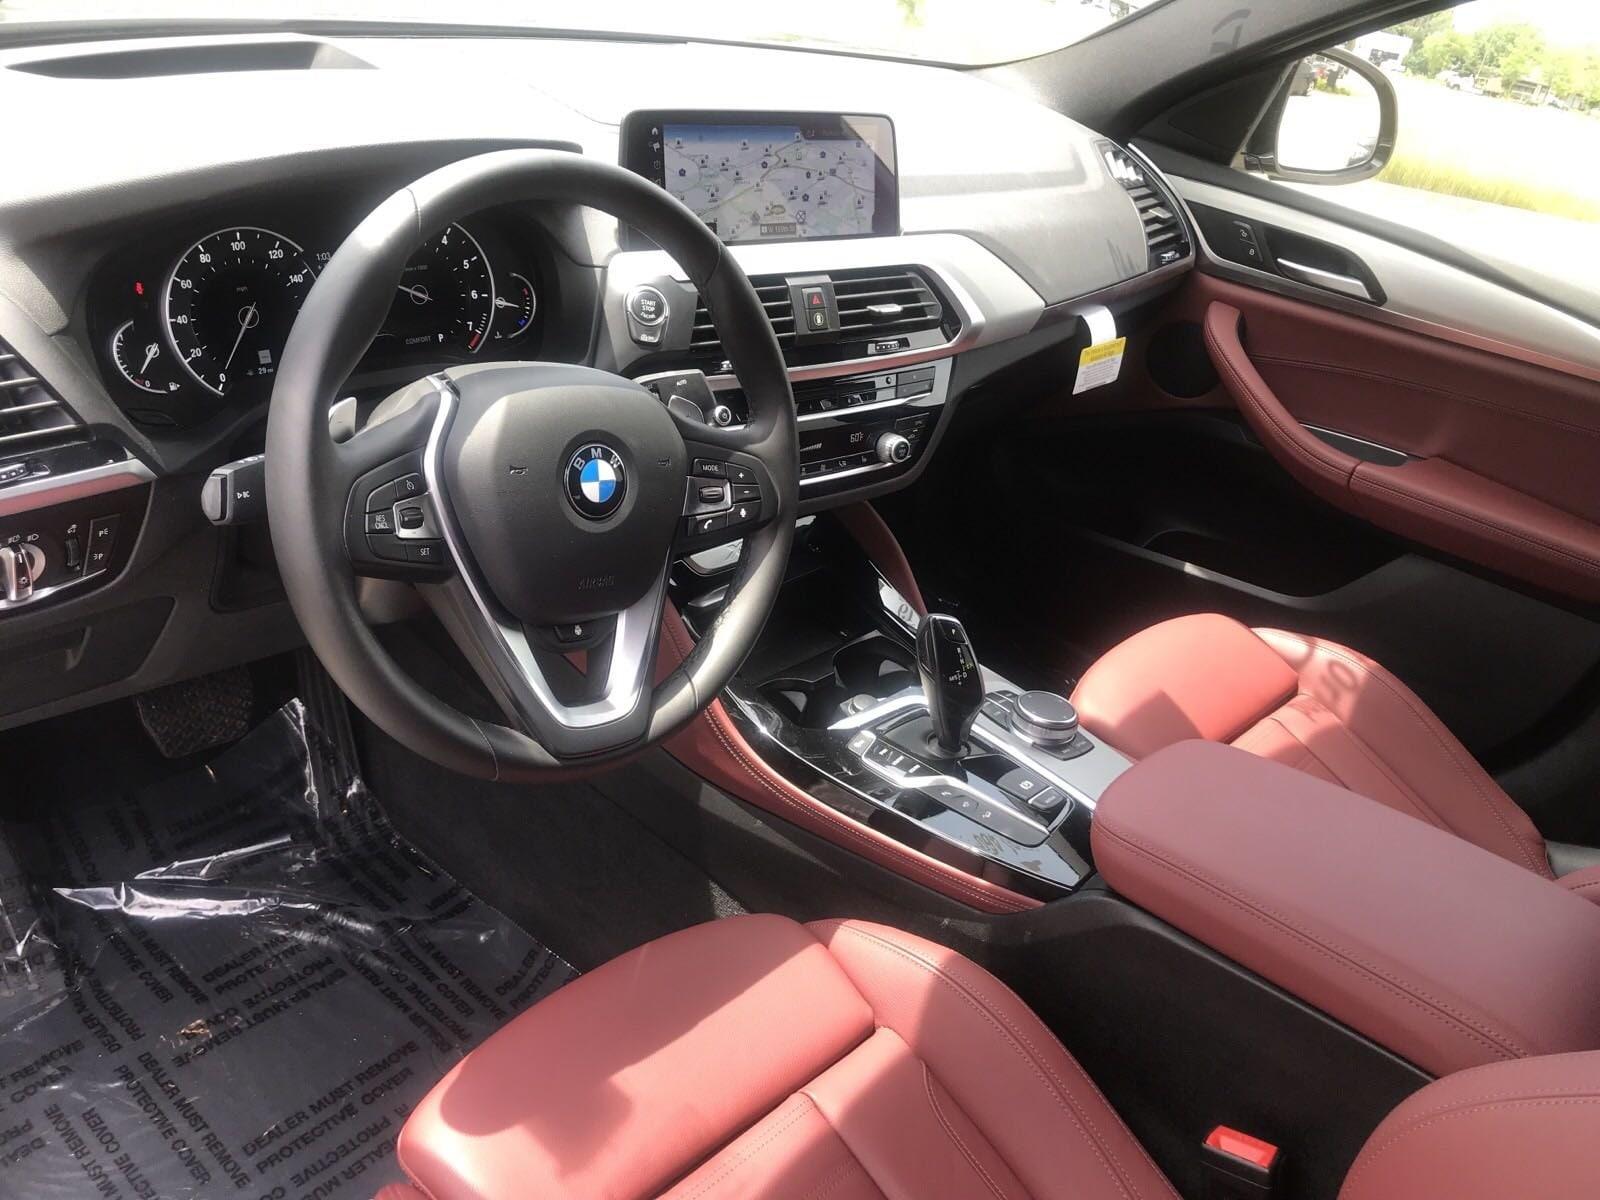 Used 2019 BMW X4 xDrive30i For Sale | Grandville MI